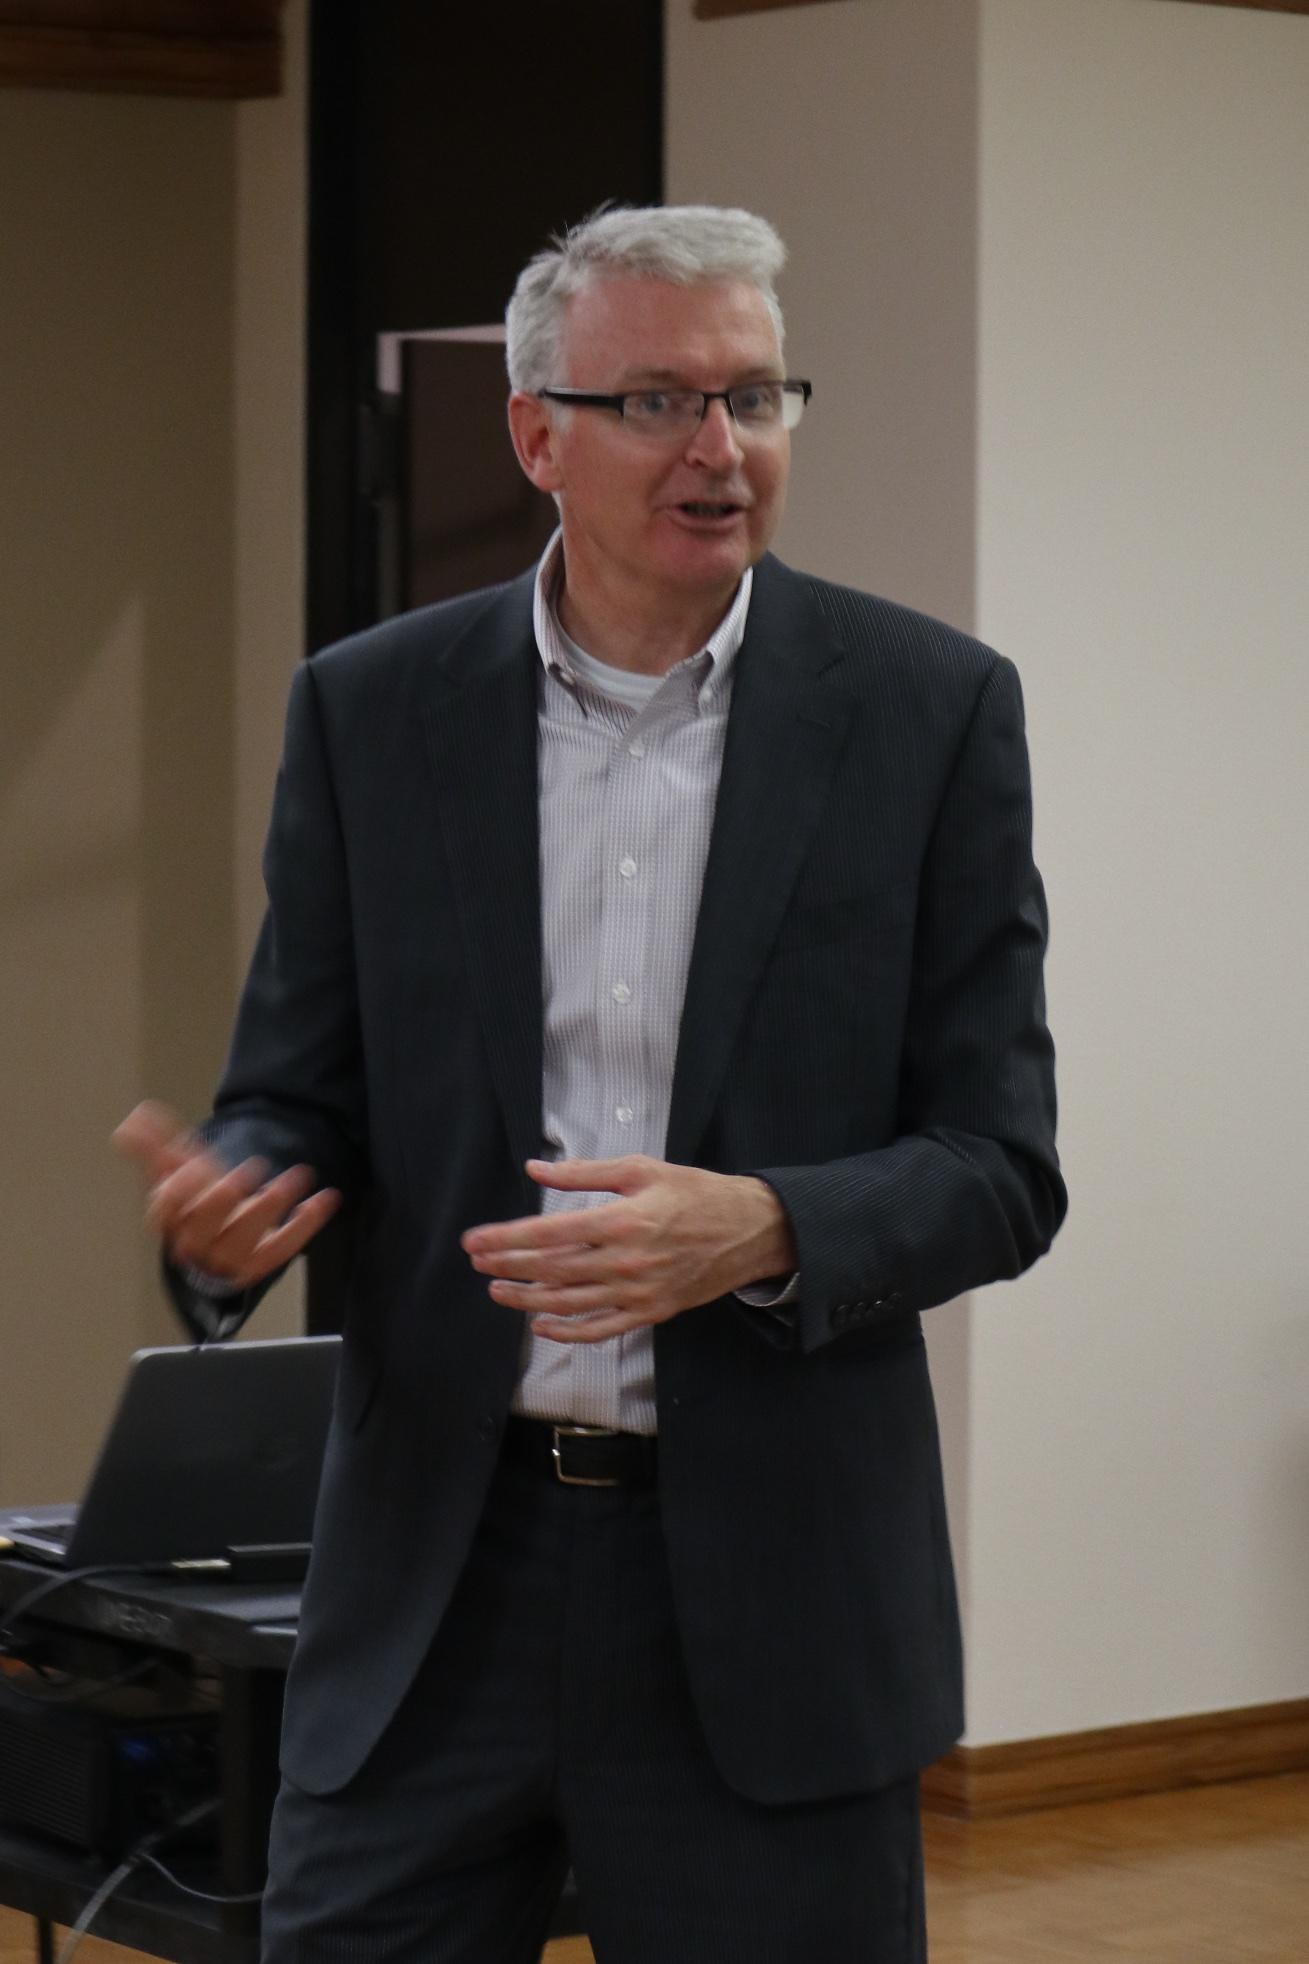 Dr. Paul Kortenaar